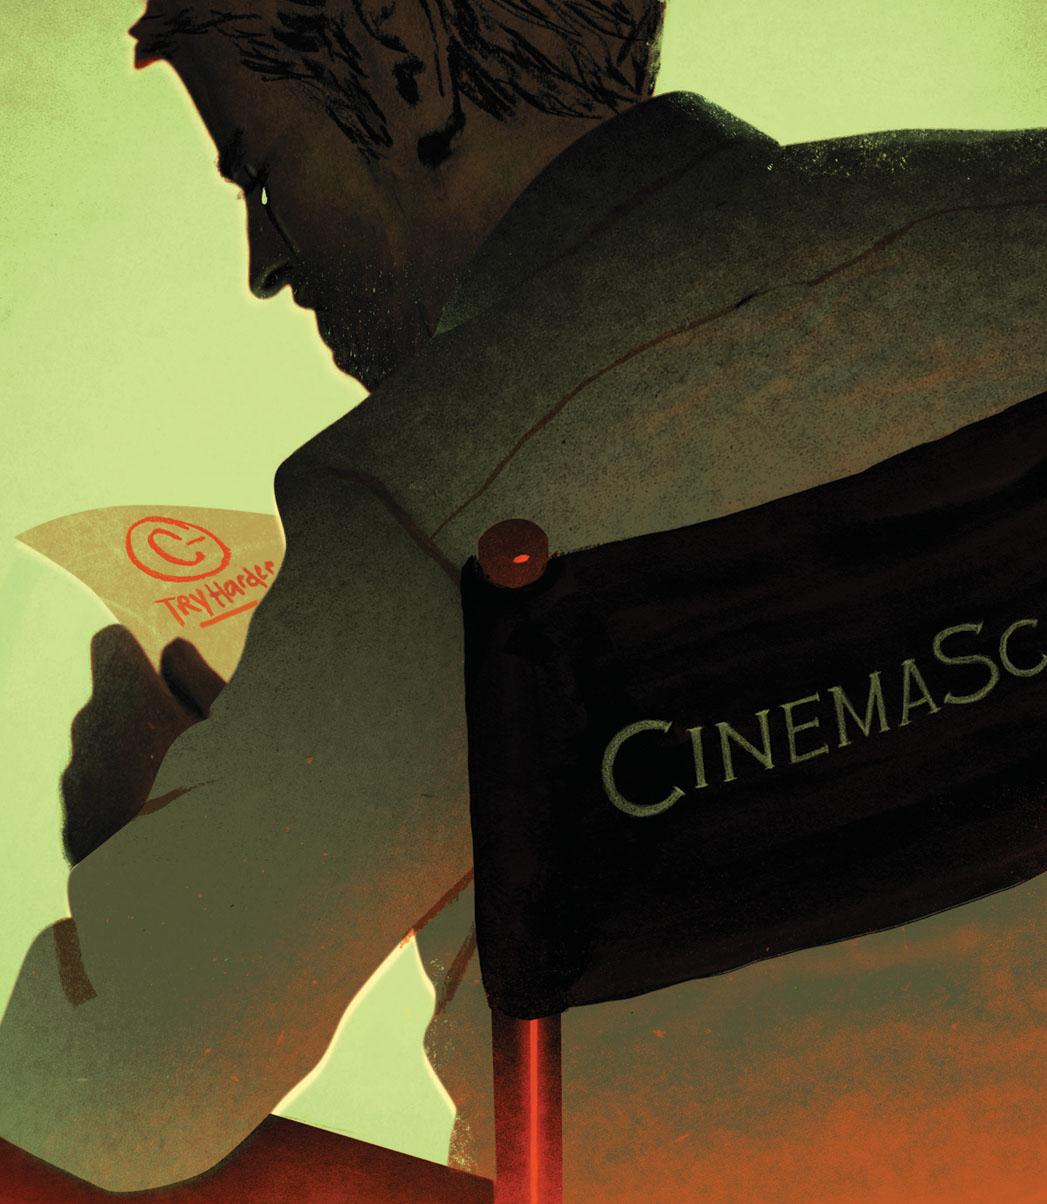 CinemaScore Illustration - P 2013